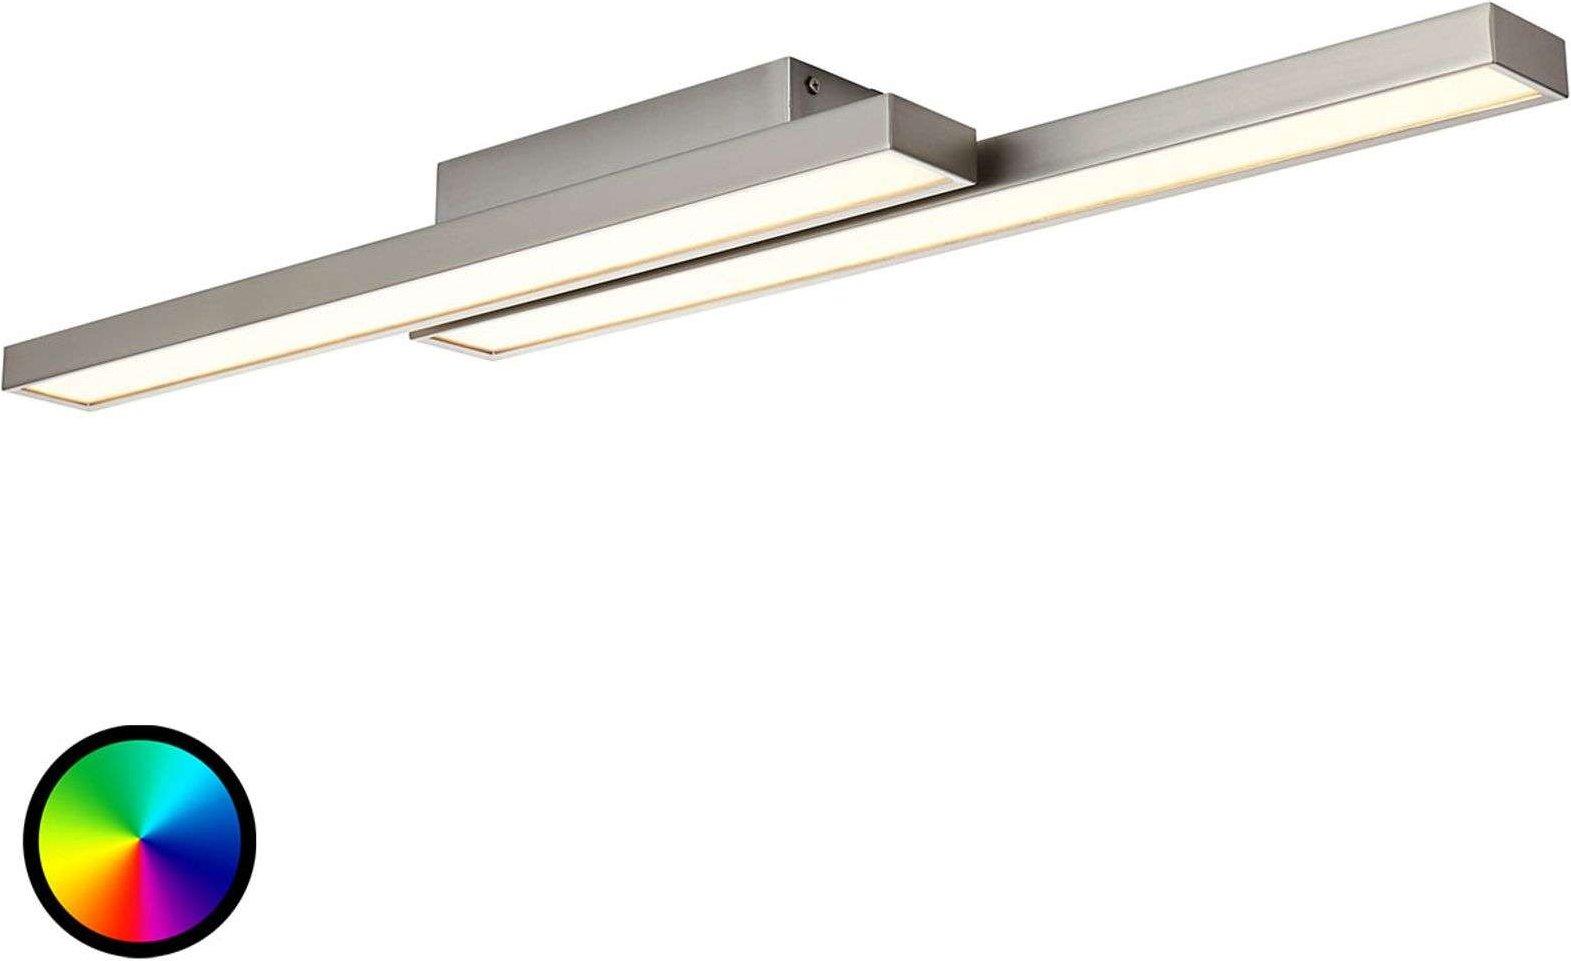 Controllable Brilliant WiZ Sword LED ceiling light